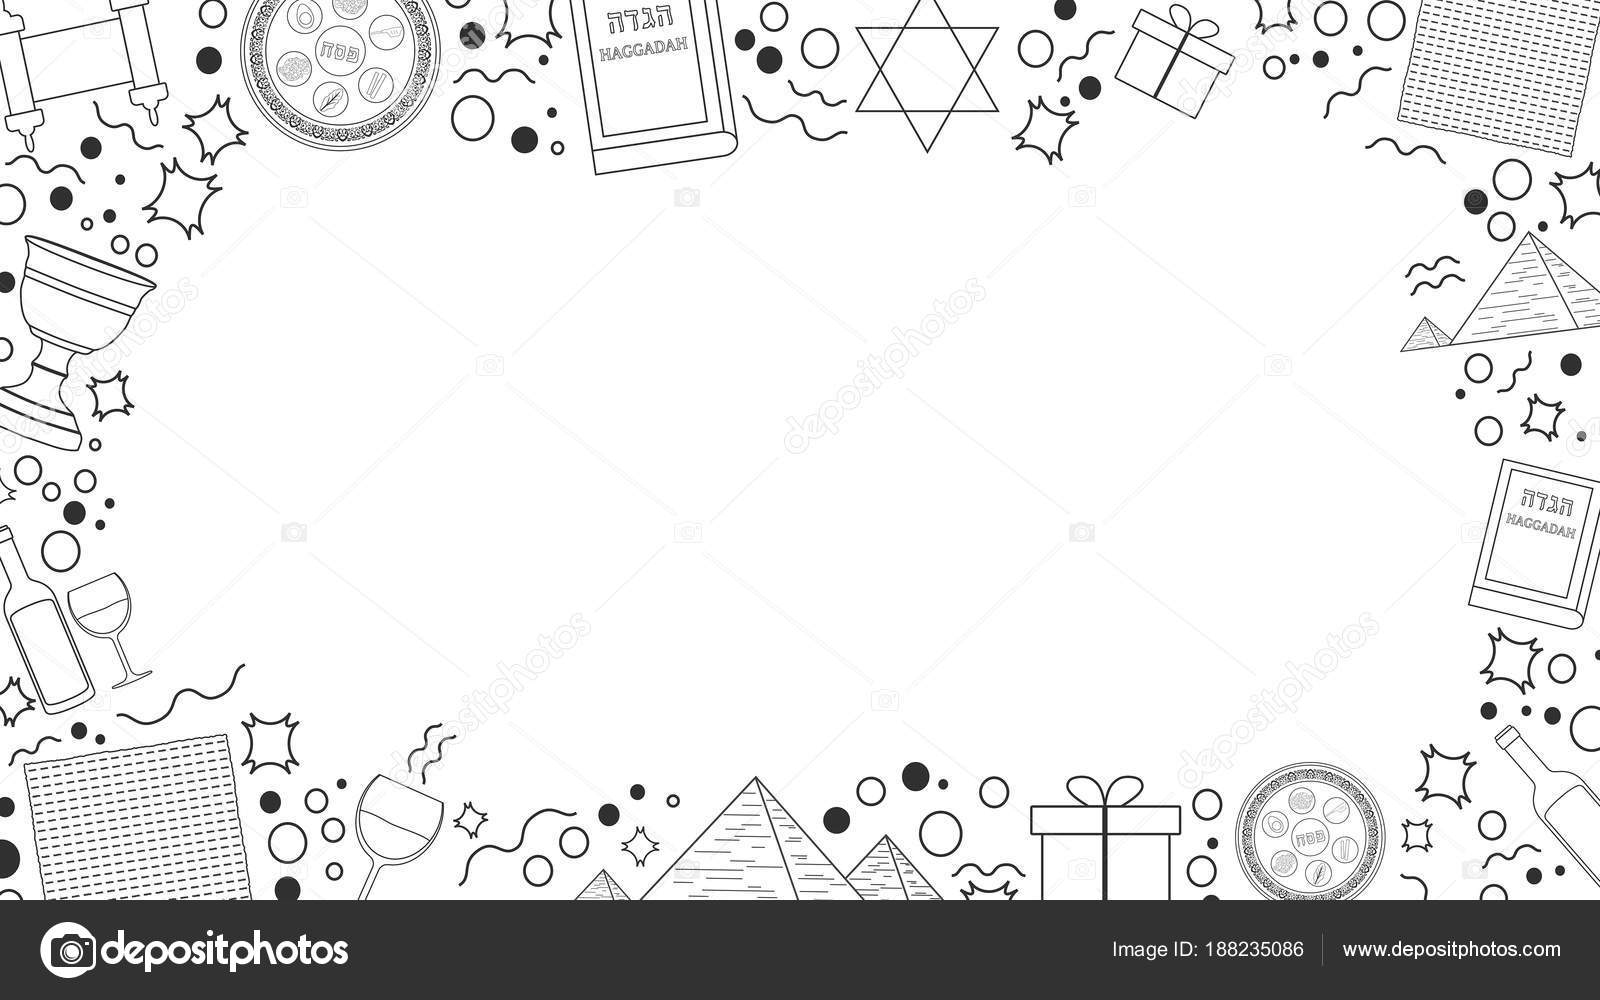 Marco con iconos de Pascua día de fiesta diseño plano línea fina ...